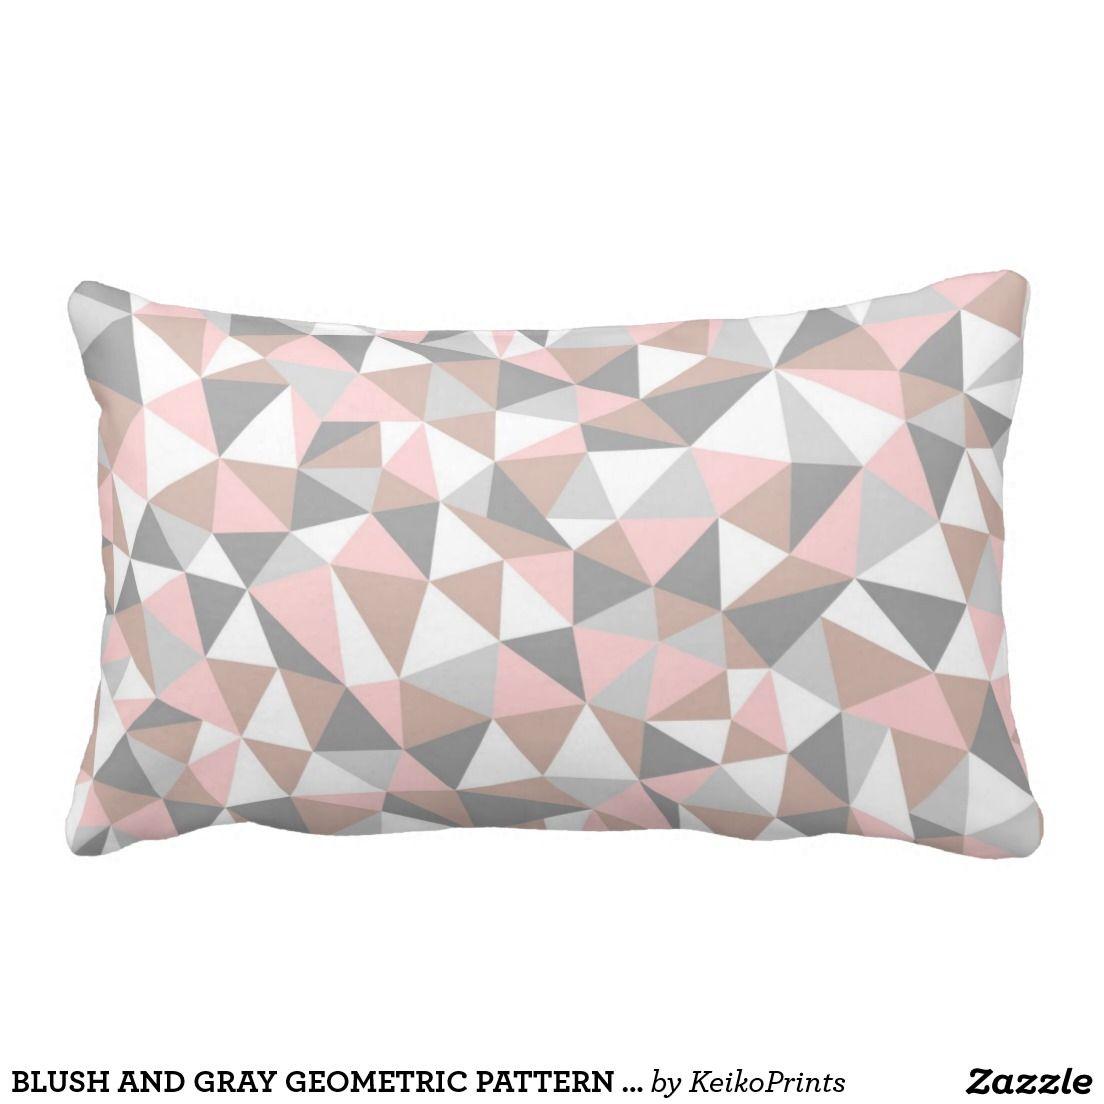 Blush And Gray Geometric Pattern Pillow Zazzle Com Pillow Pattern Pink And Grey Cushions Patterned Throw Pillows